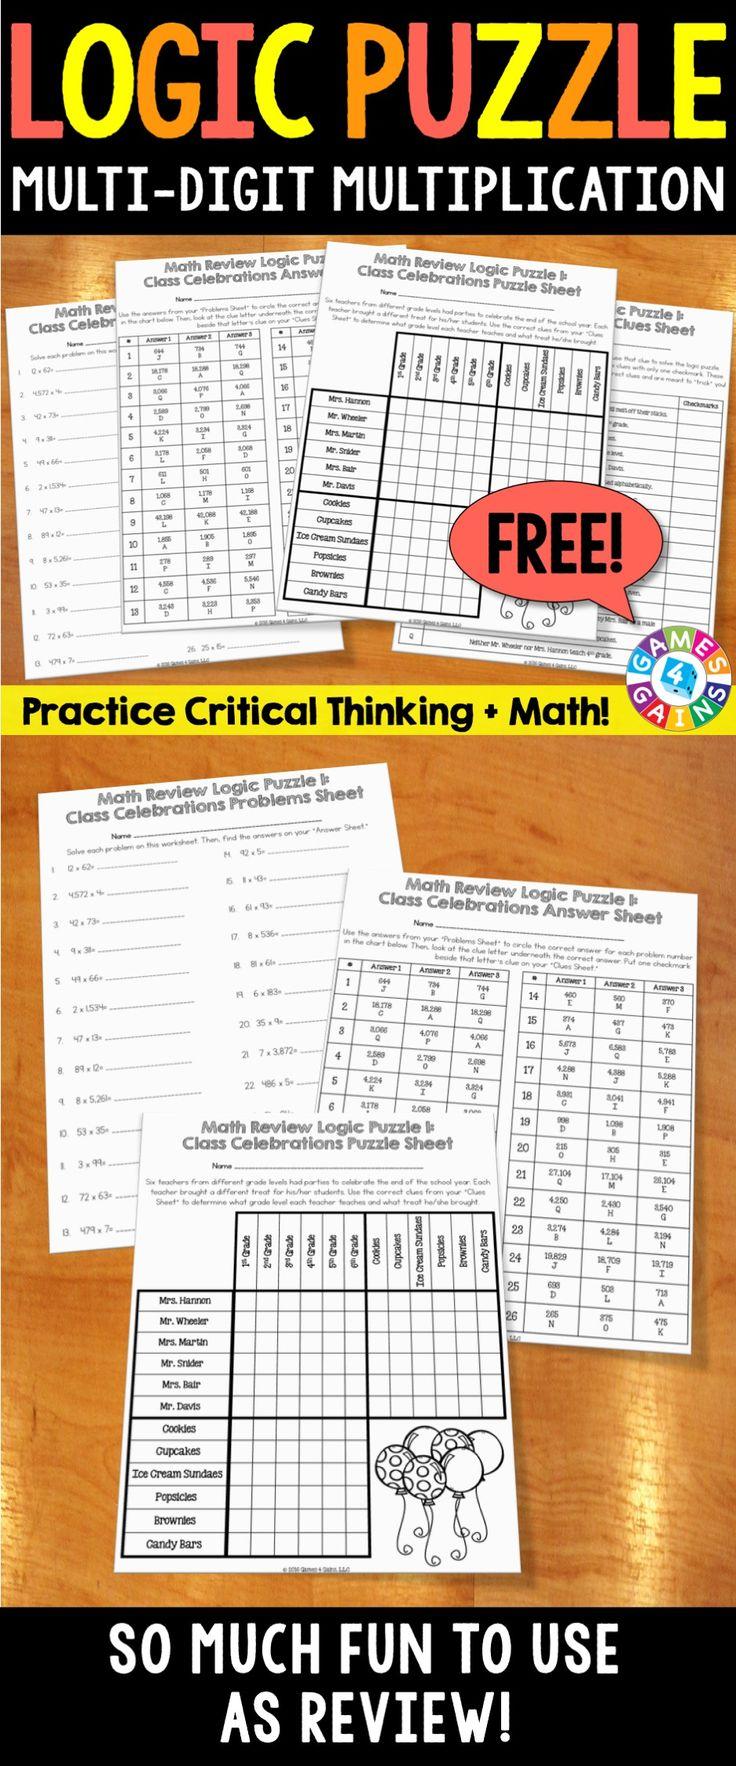 Math and critical thinking skills